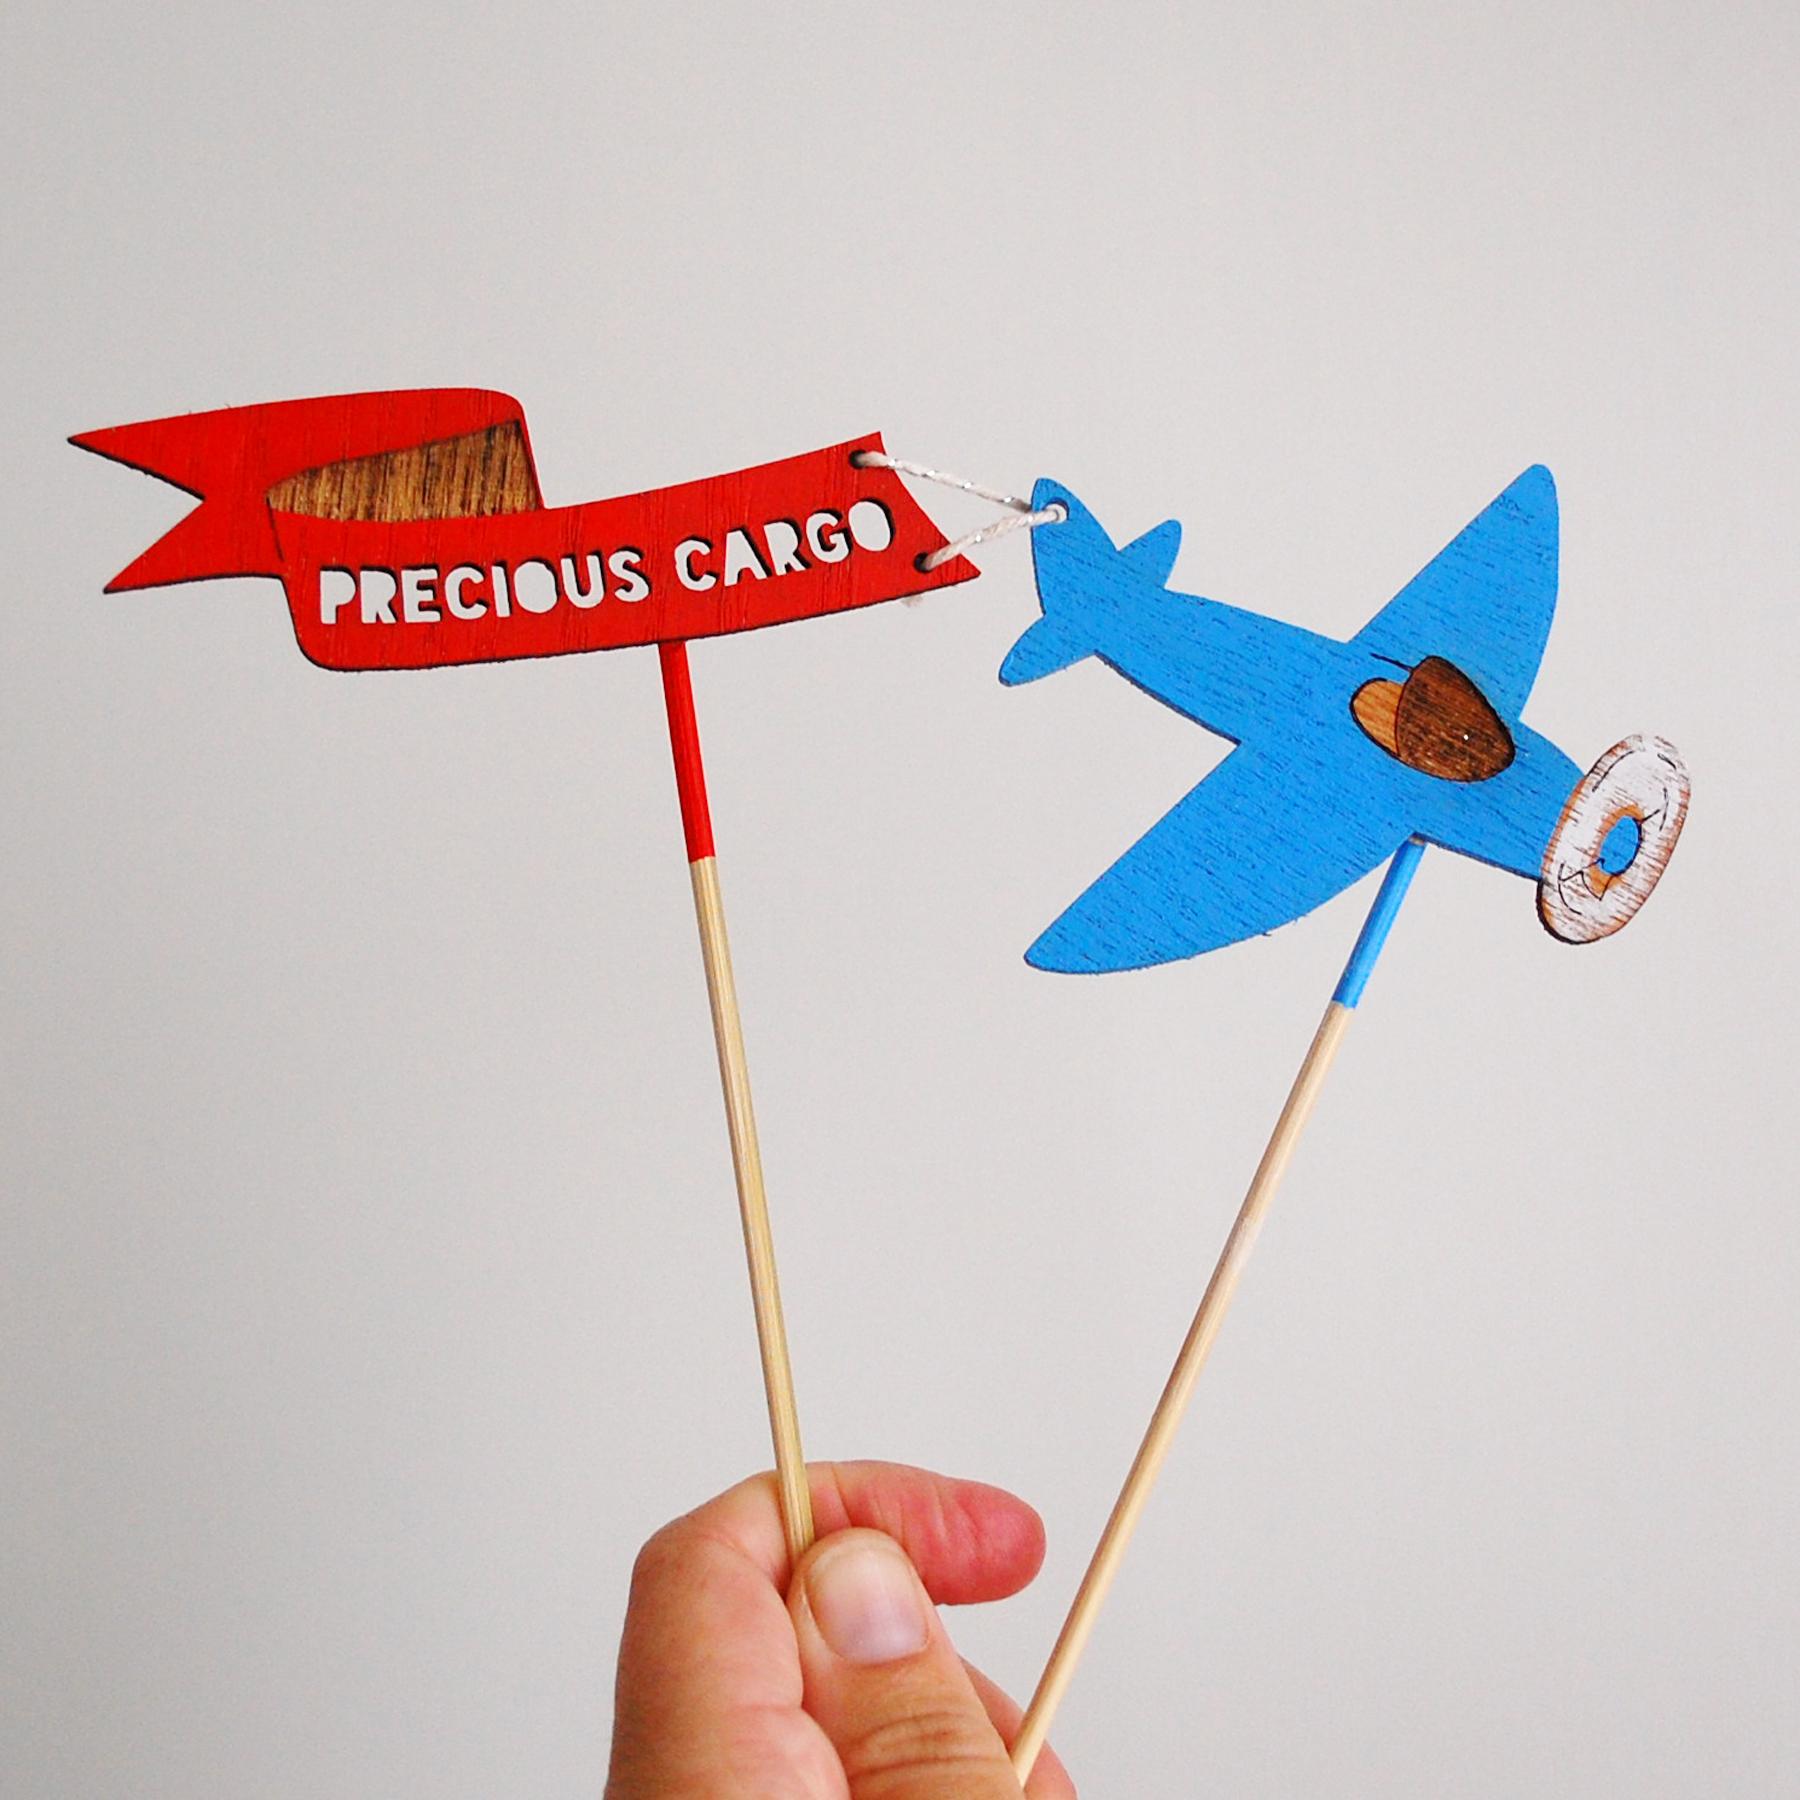 Plane_Precious_Cargo_Banner.jpg